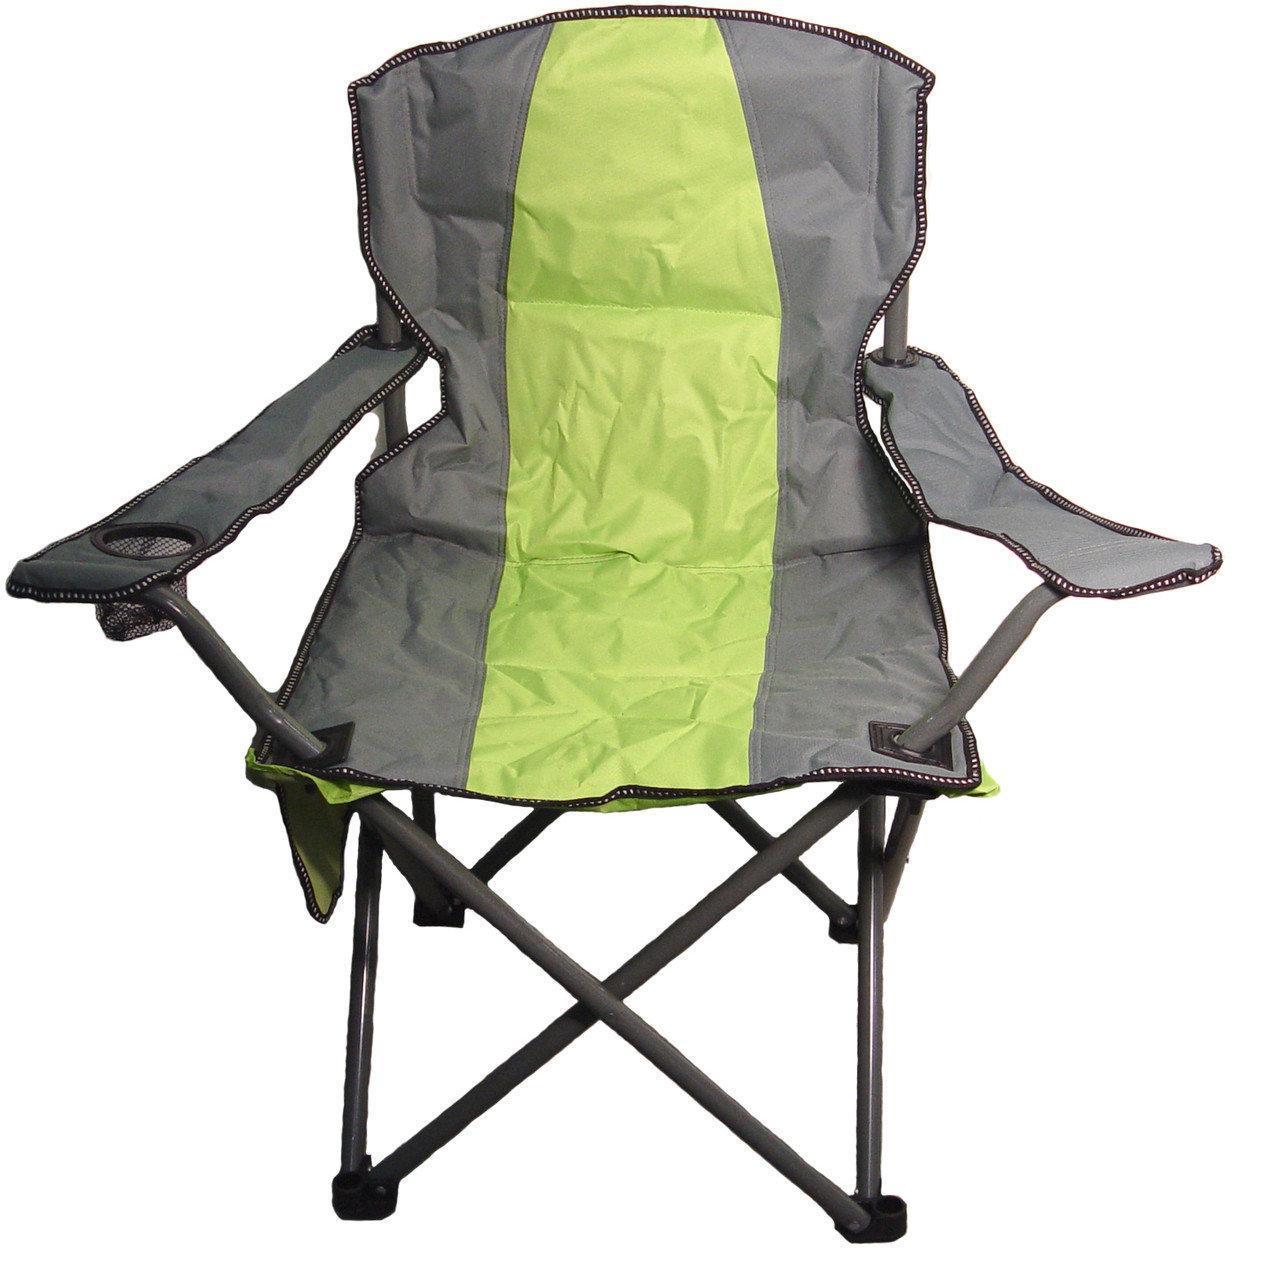 Кресло раскладное Директор Лайт R28842, 90х54х100 см - зеленый